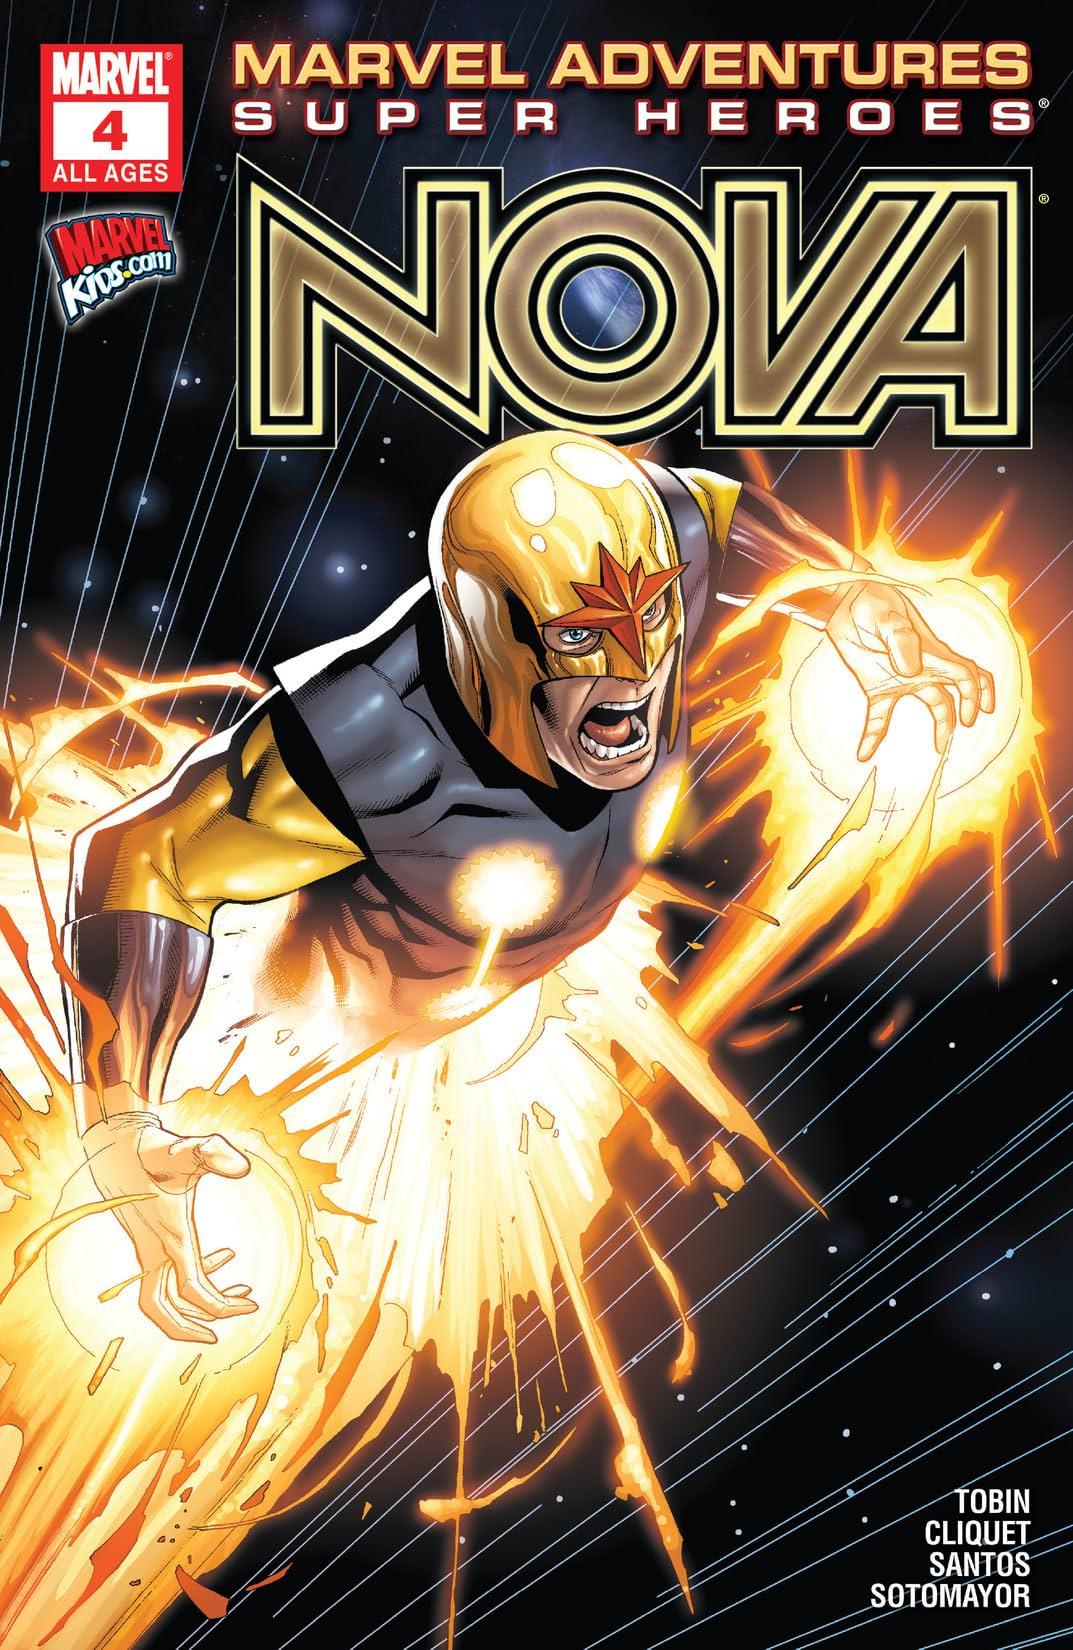 Marvel Adventures: Super Heroes (2010-2012) #4